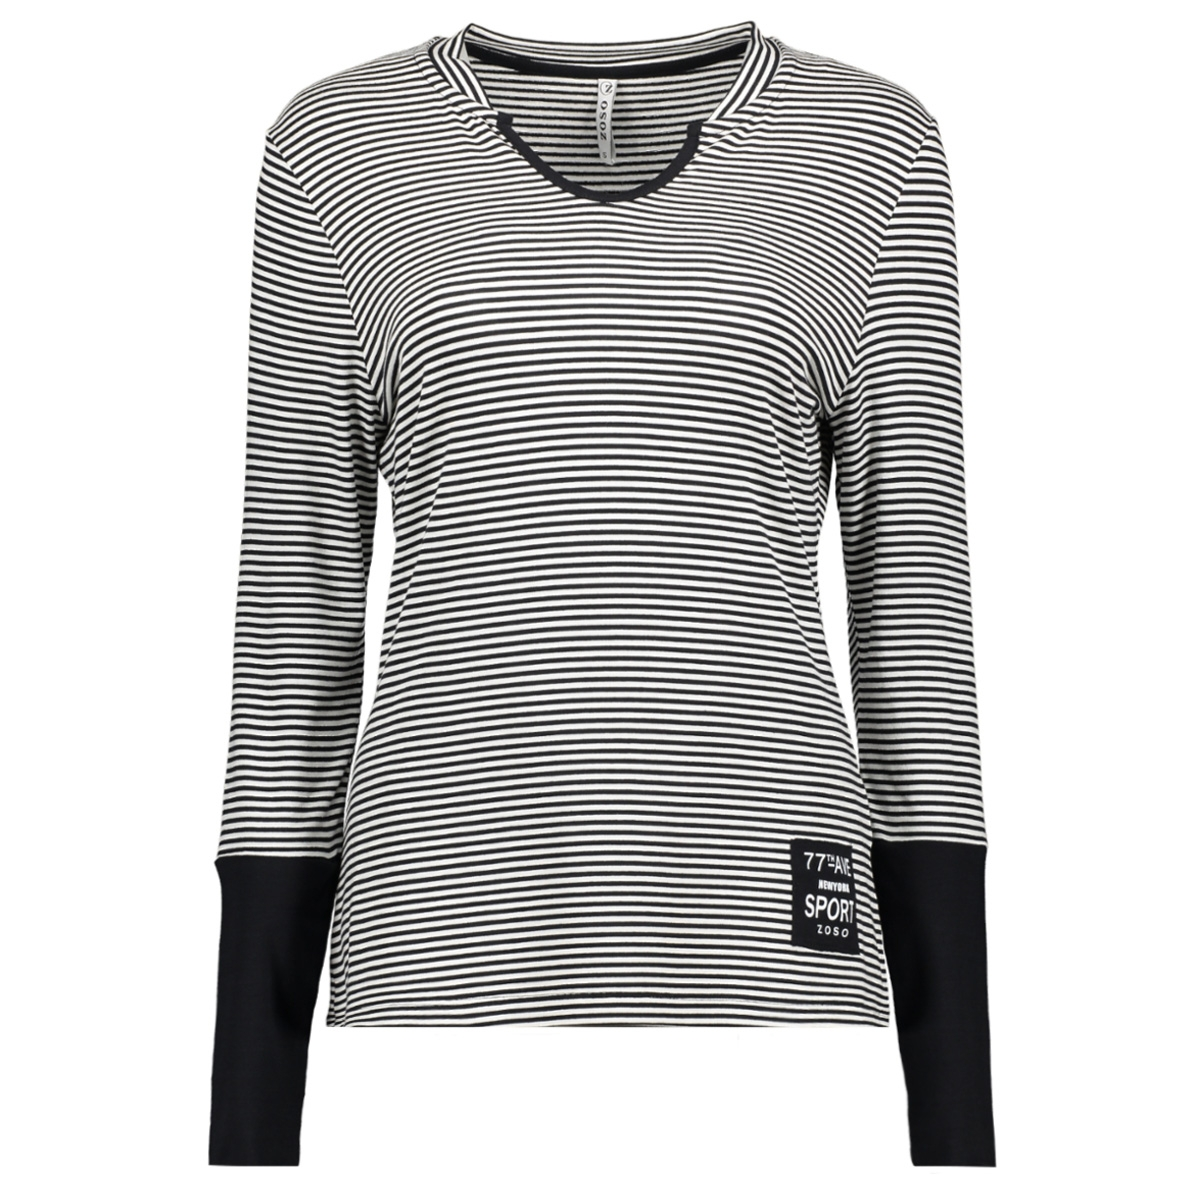 ay1902 zoso t-shirt navy